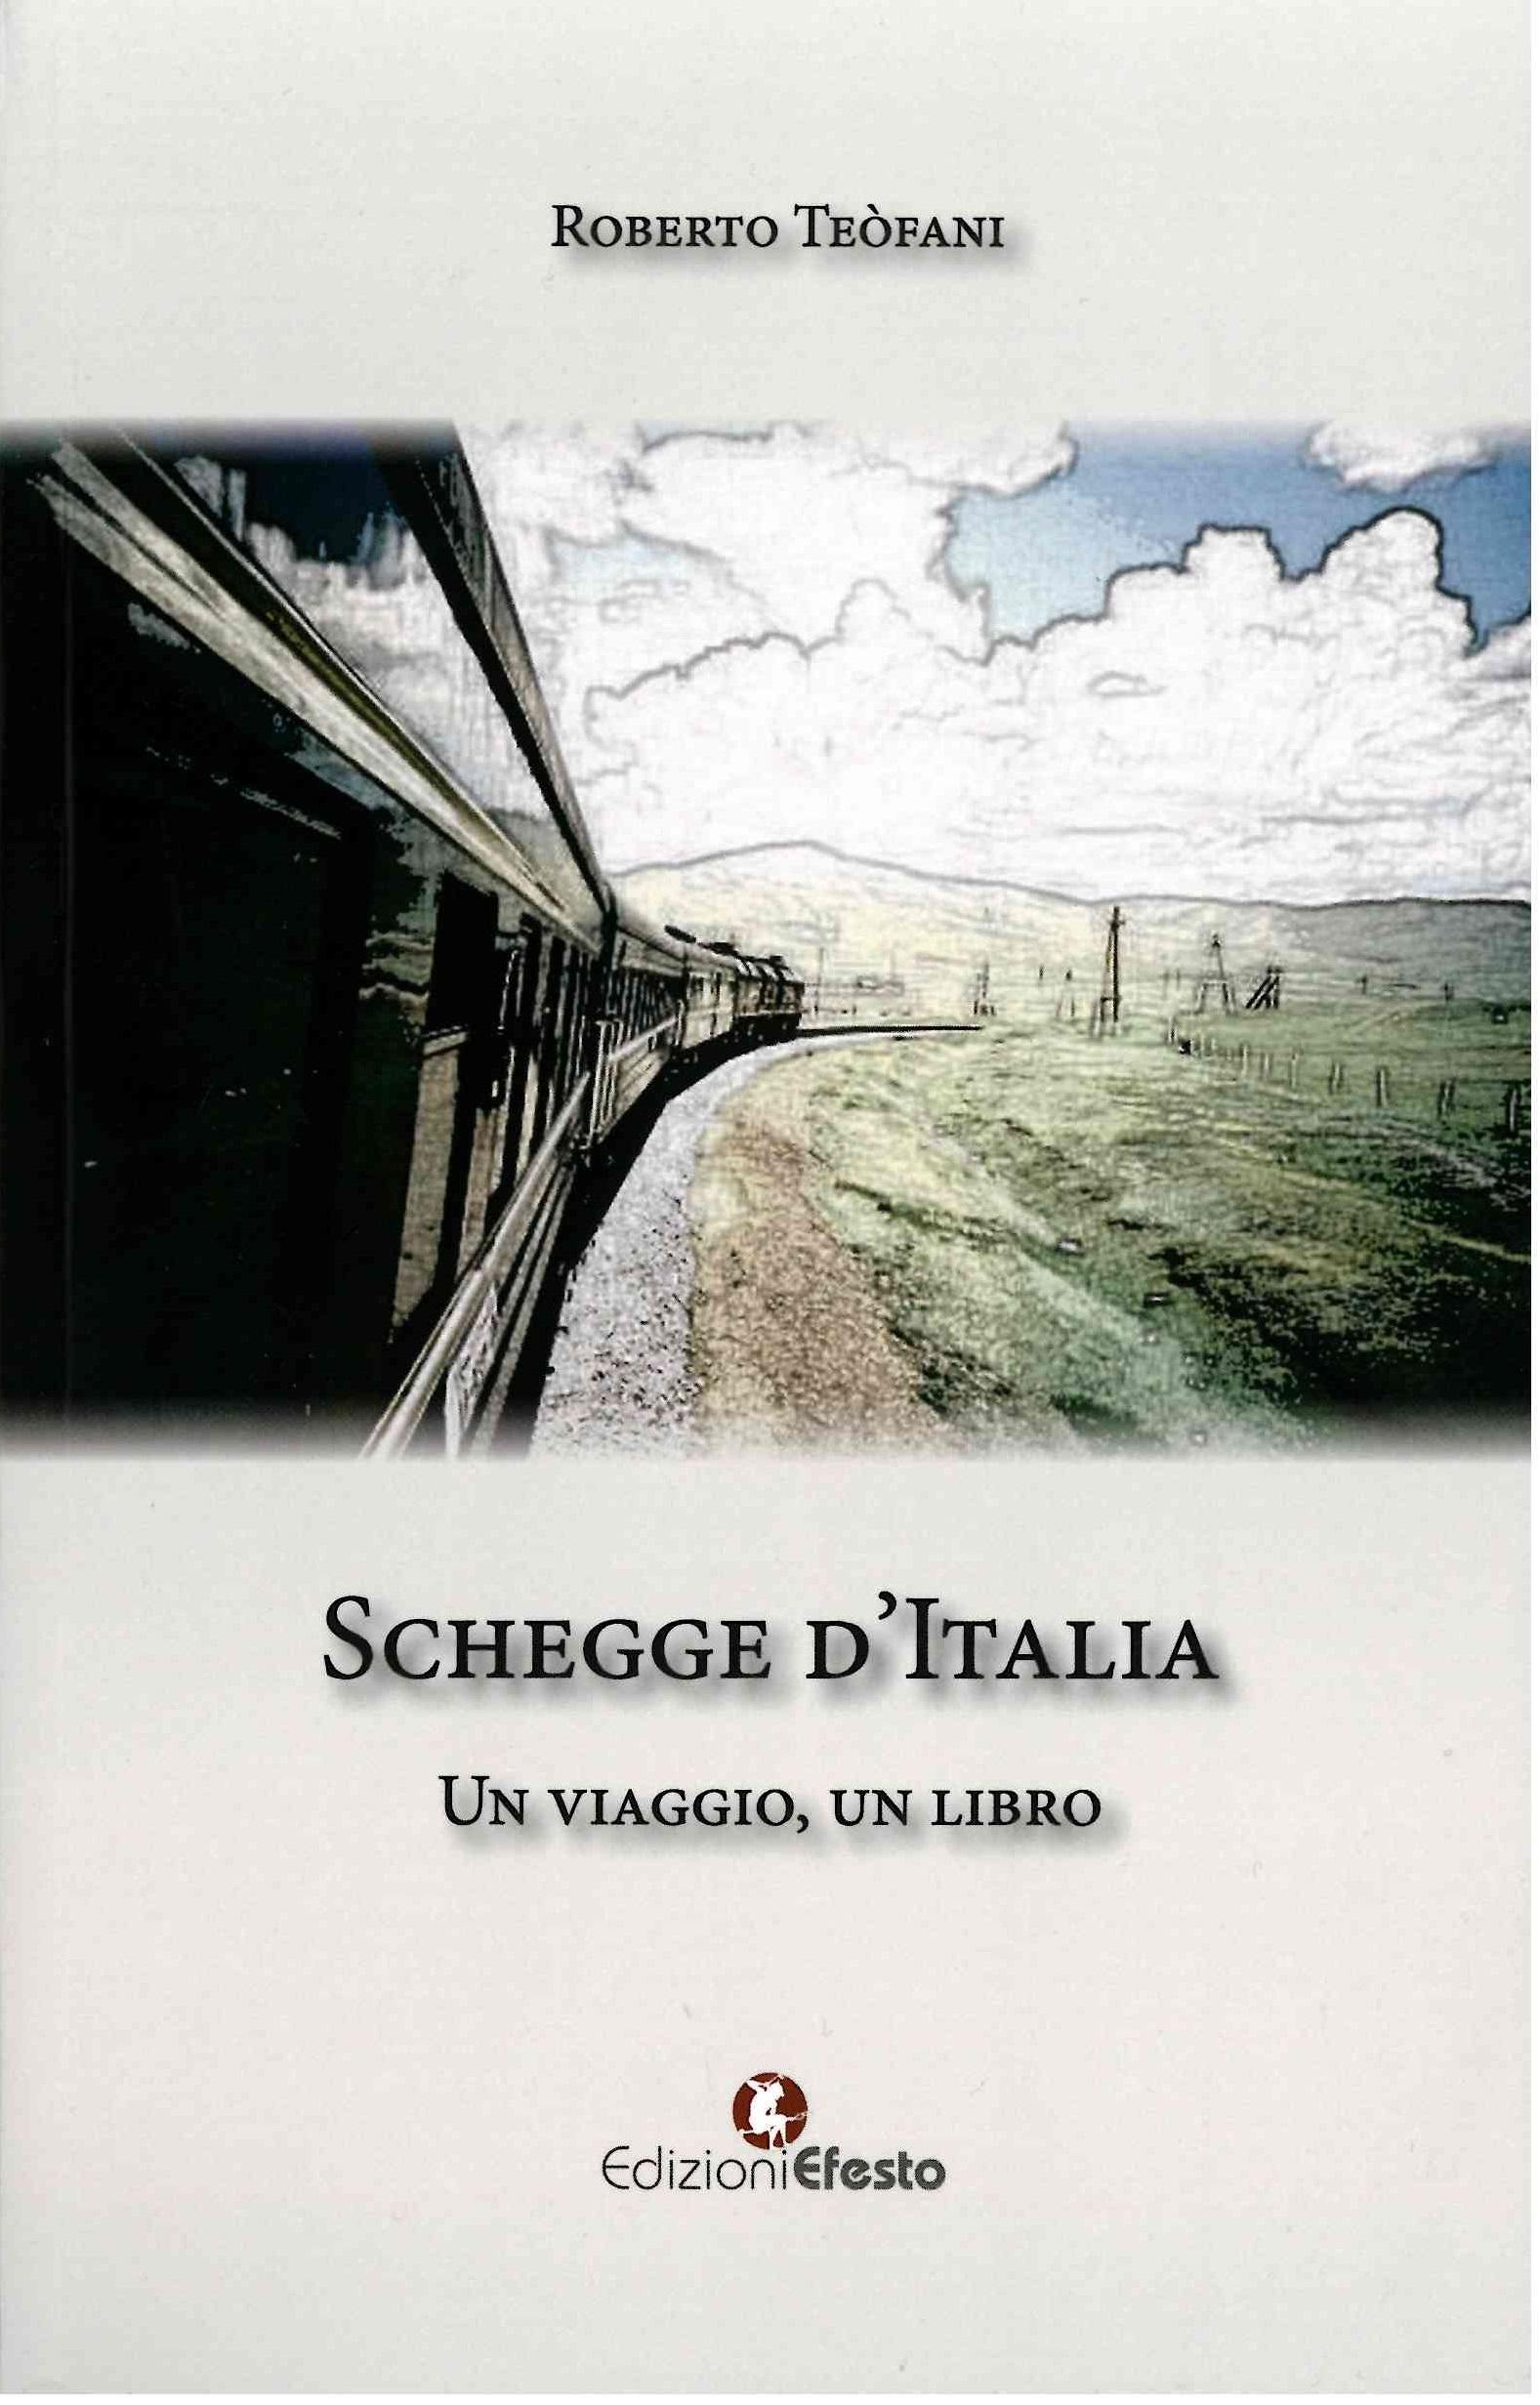 Schegge d'Italia